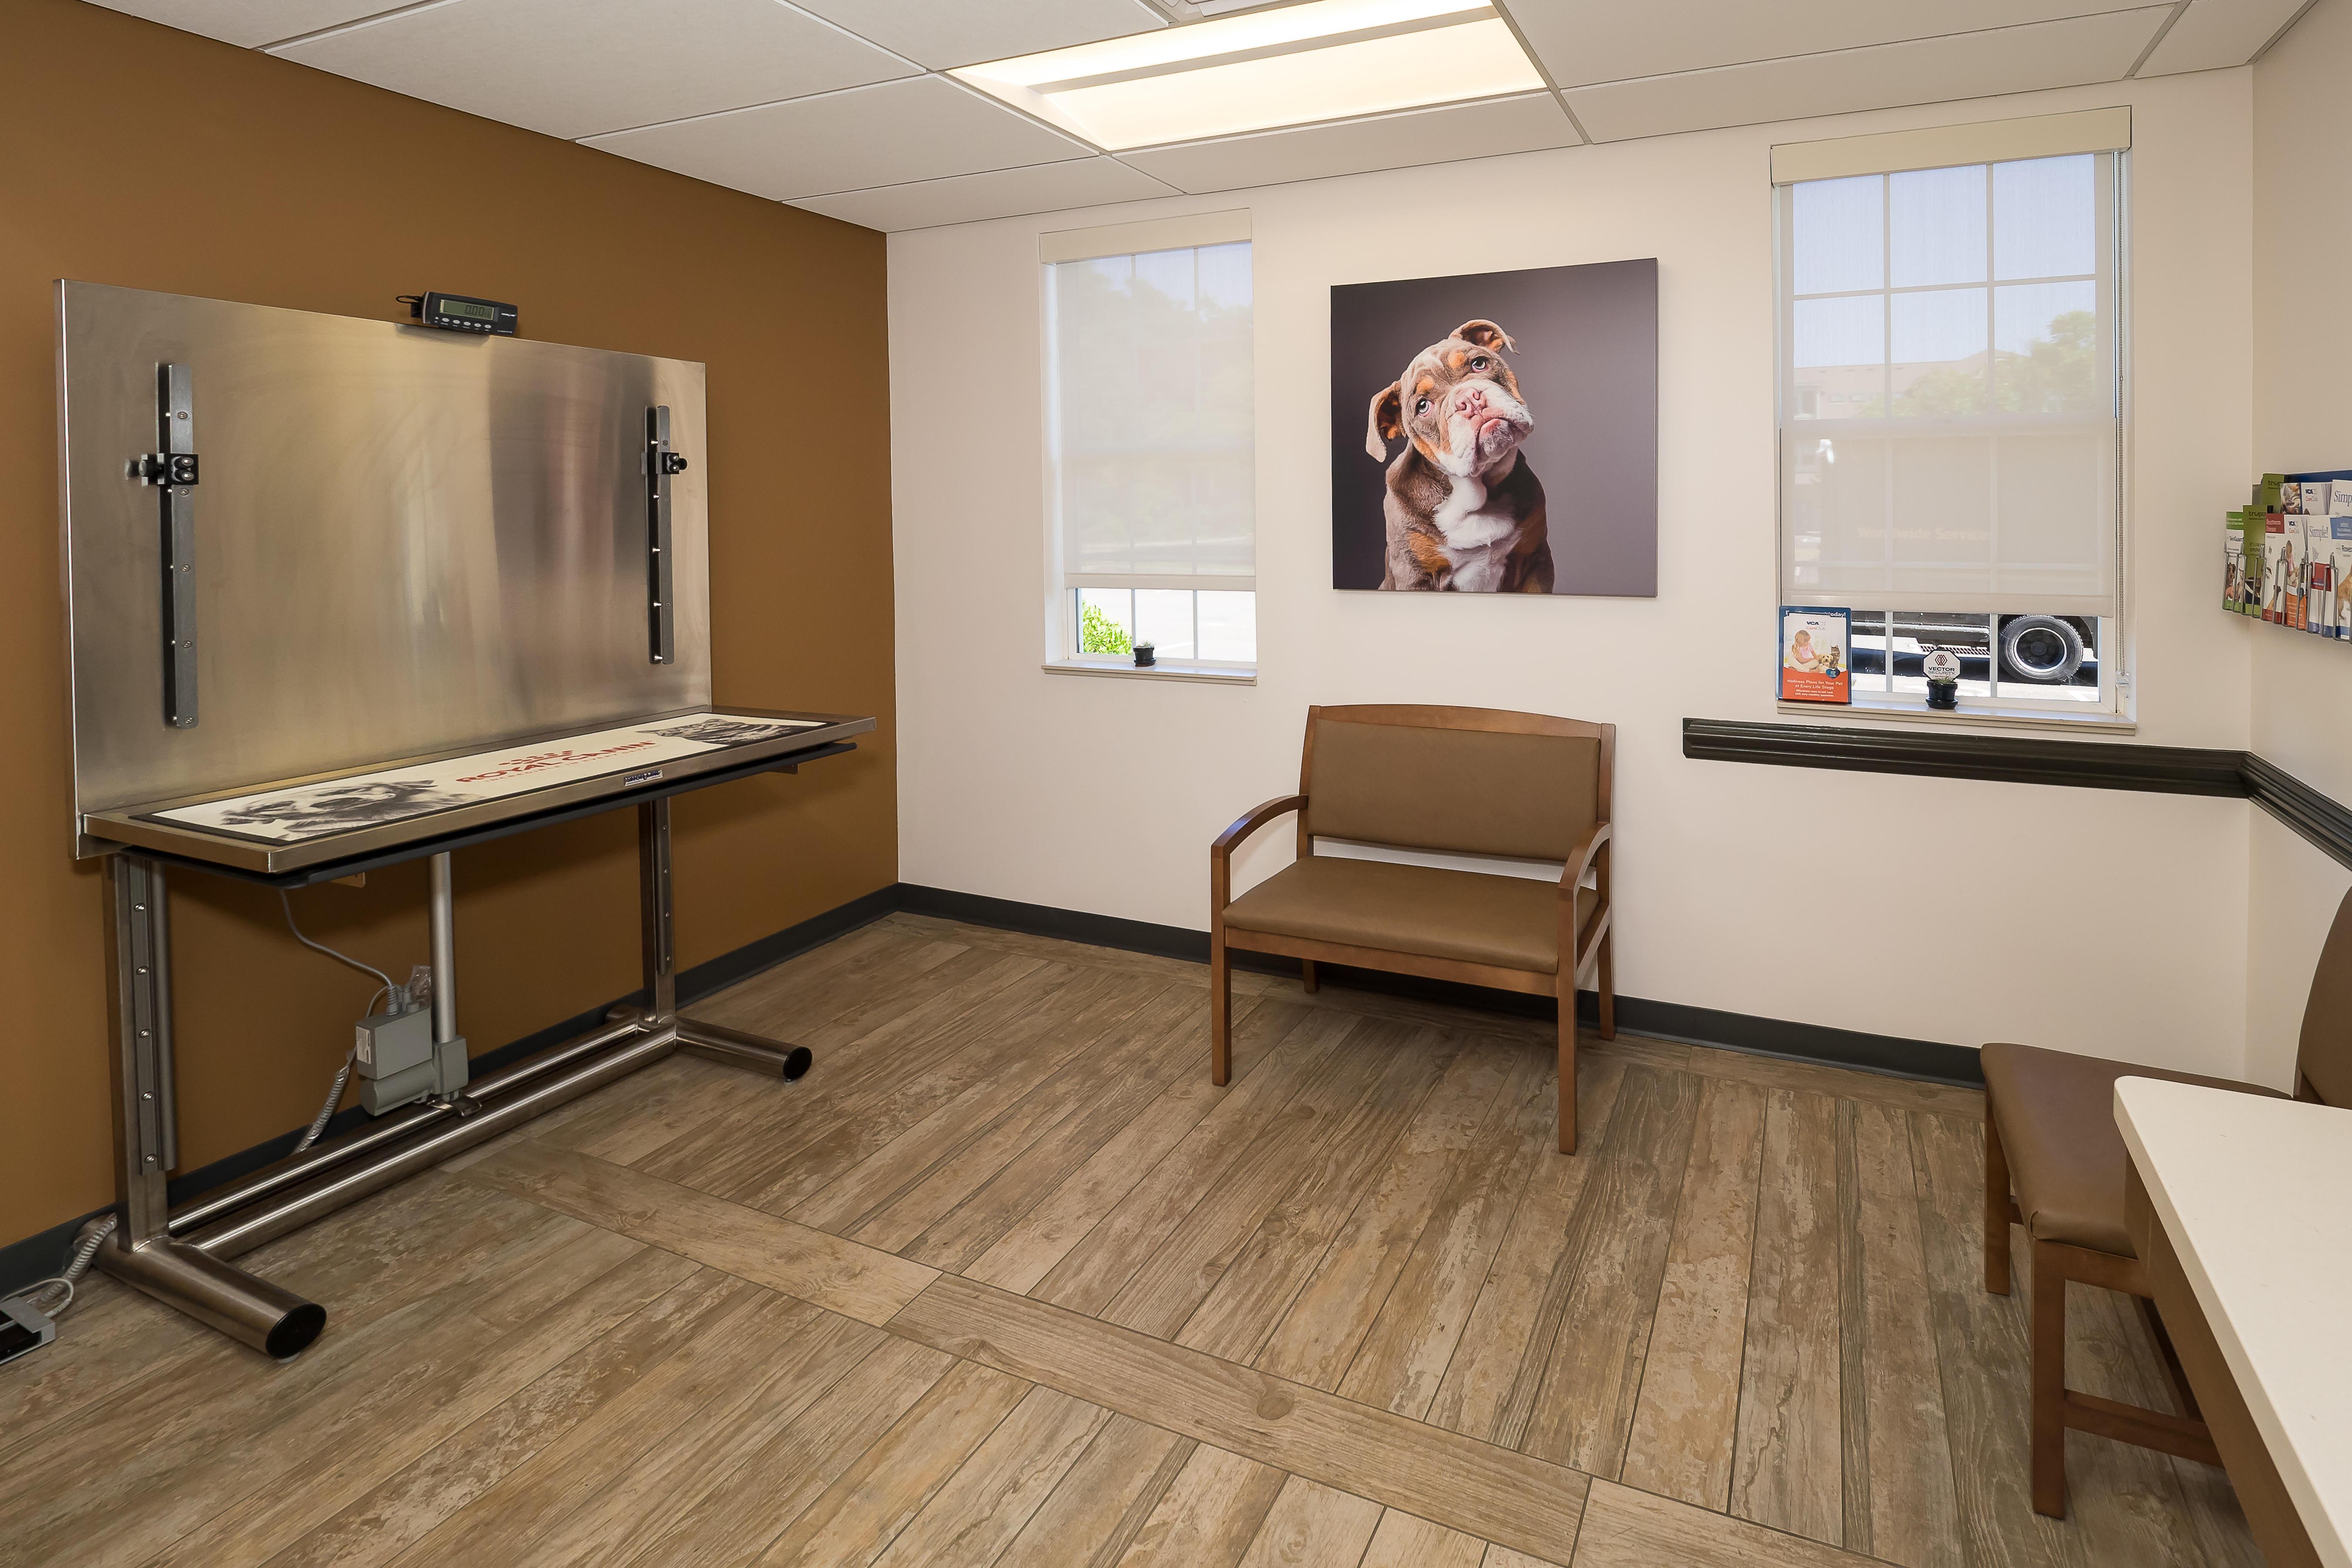 VCA Delaware Valley Animal Hospital image 2